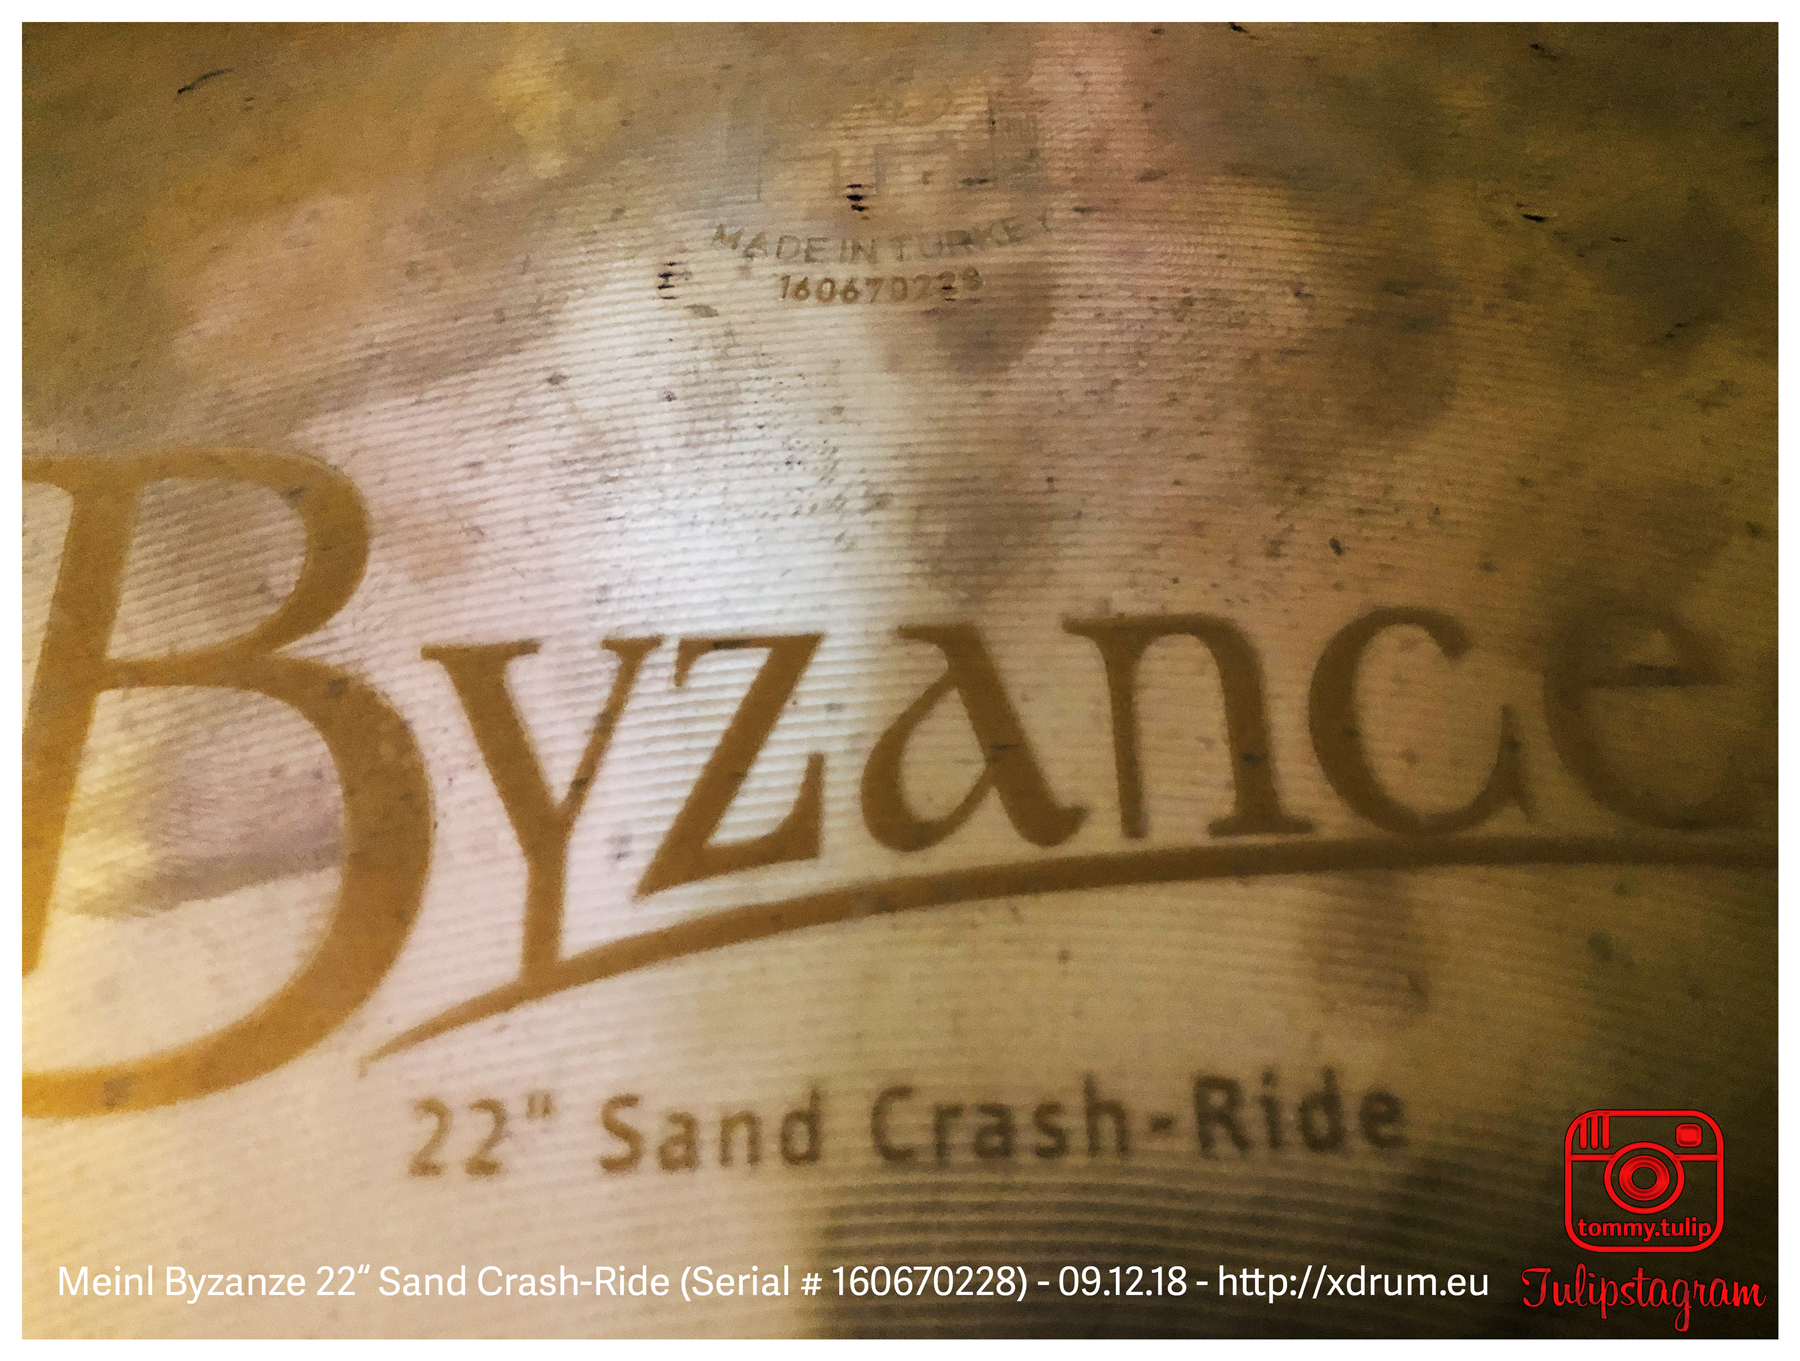 "Meinl Sand Crash-Ride 22"" (Serial # 160670228) - 09.12.18 (© #TTT)"